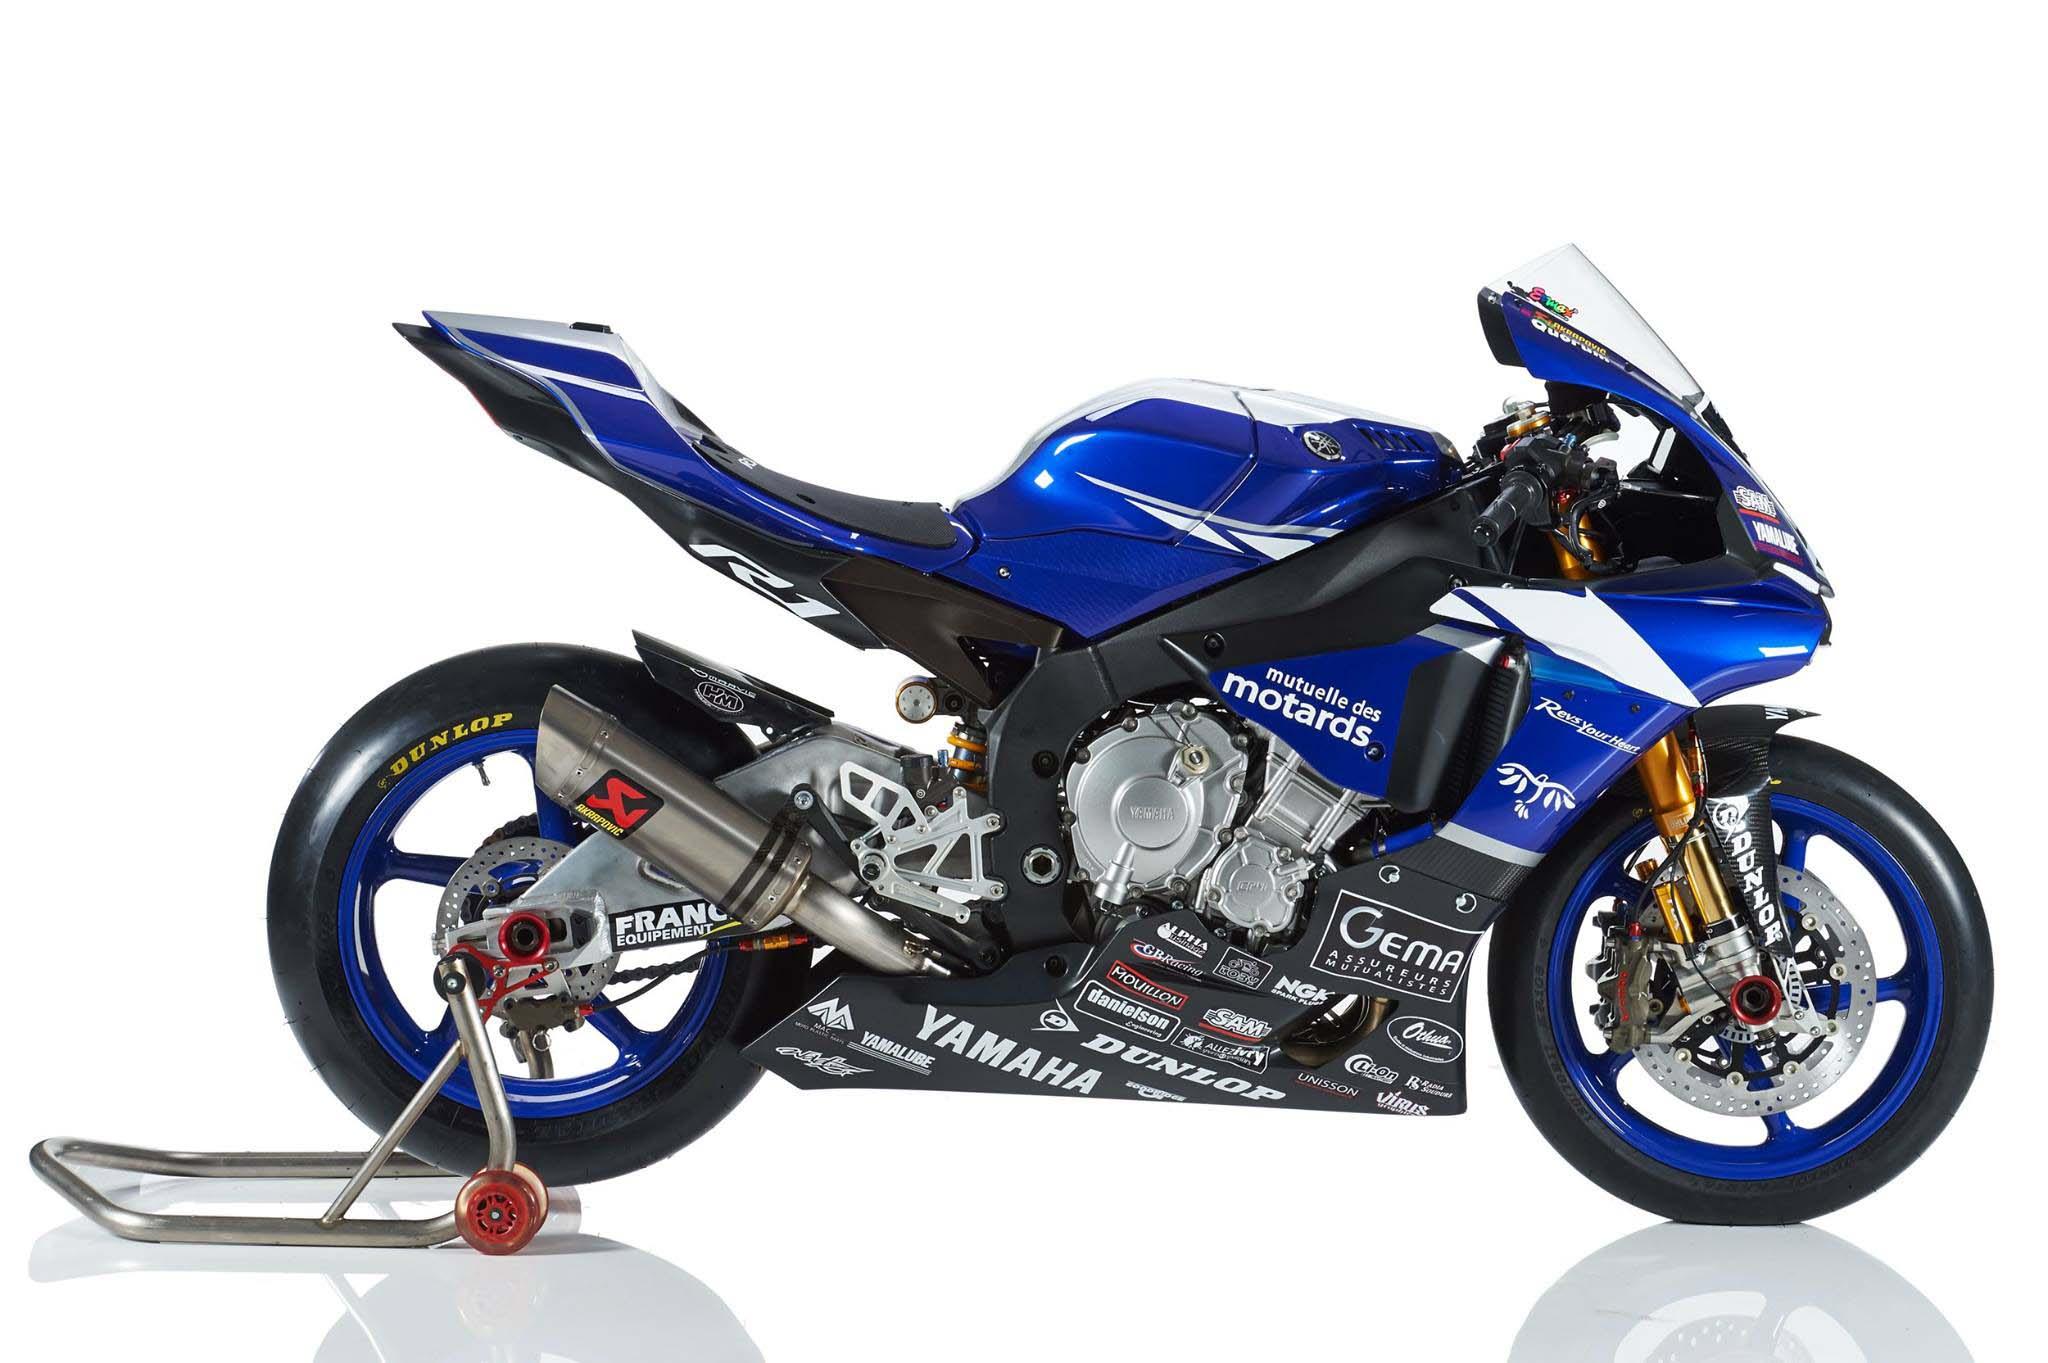 xxx the 2015 yamaha yzfr1 world endurance race bike is